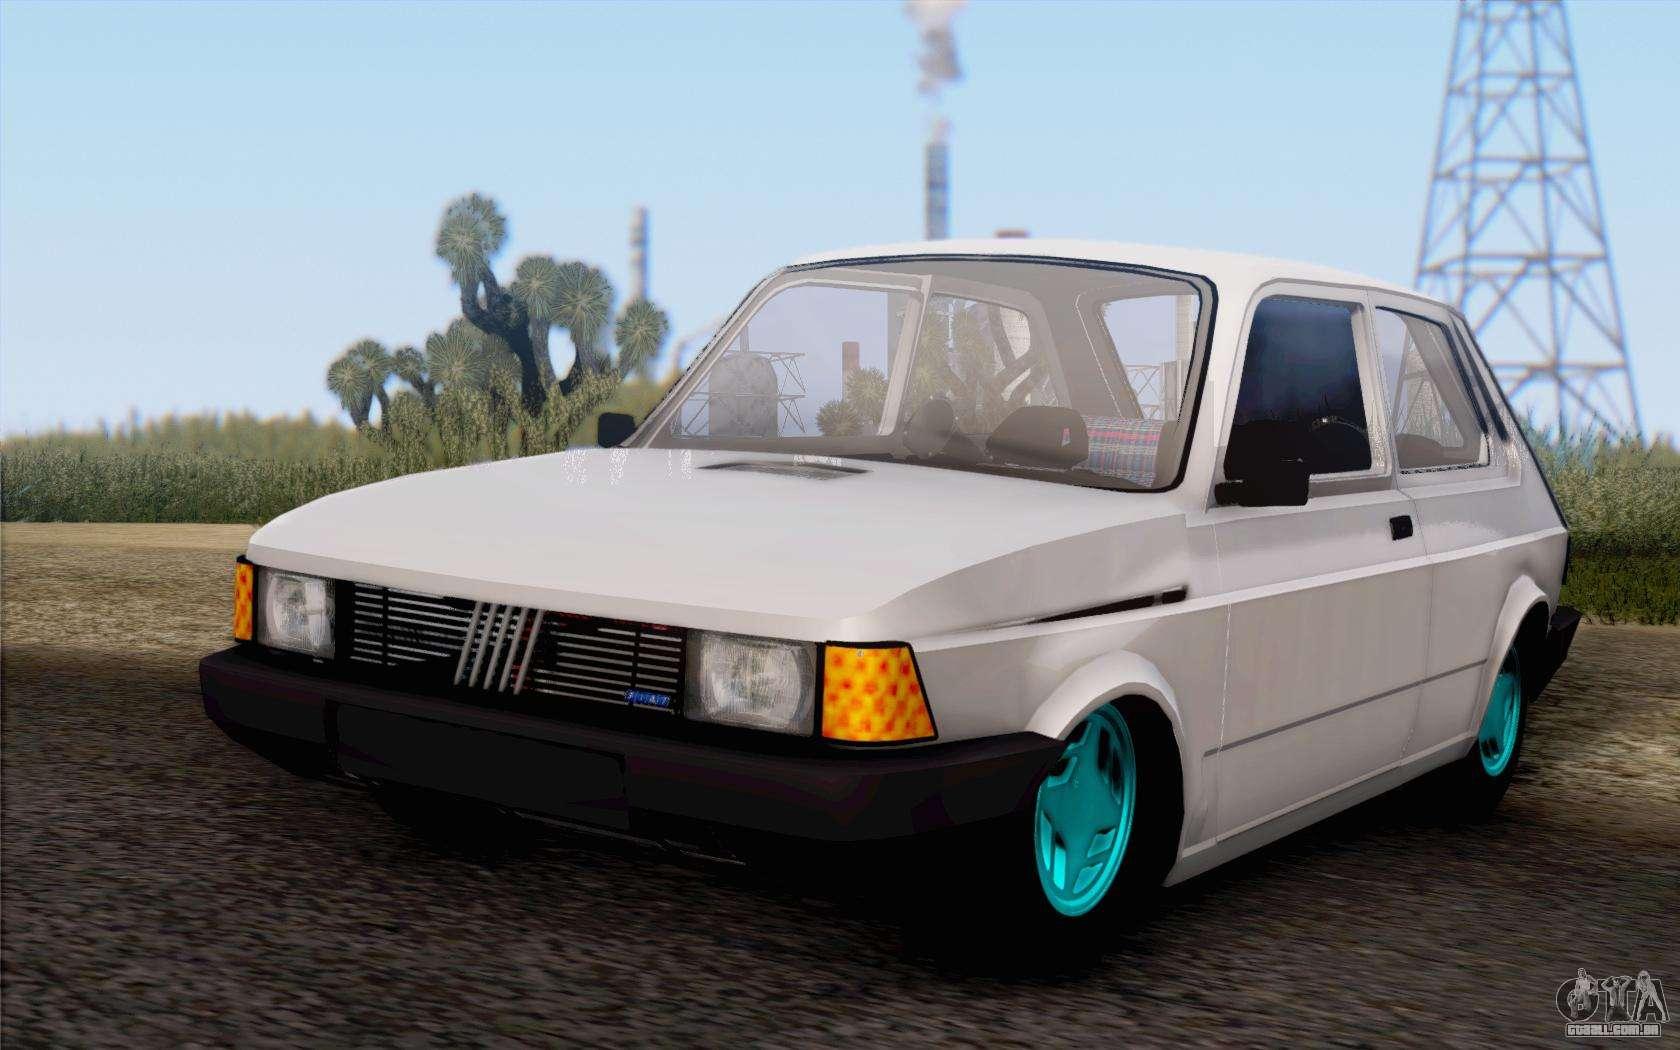 Gta 5 Cars Wallpaper Download Fiat 147 Spazio Tr Para Gta San Andreas